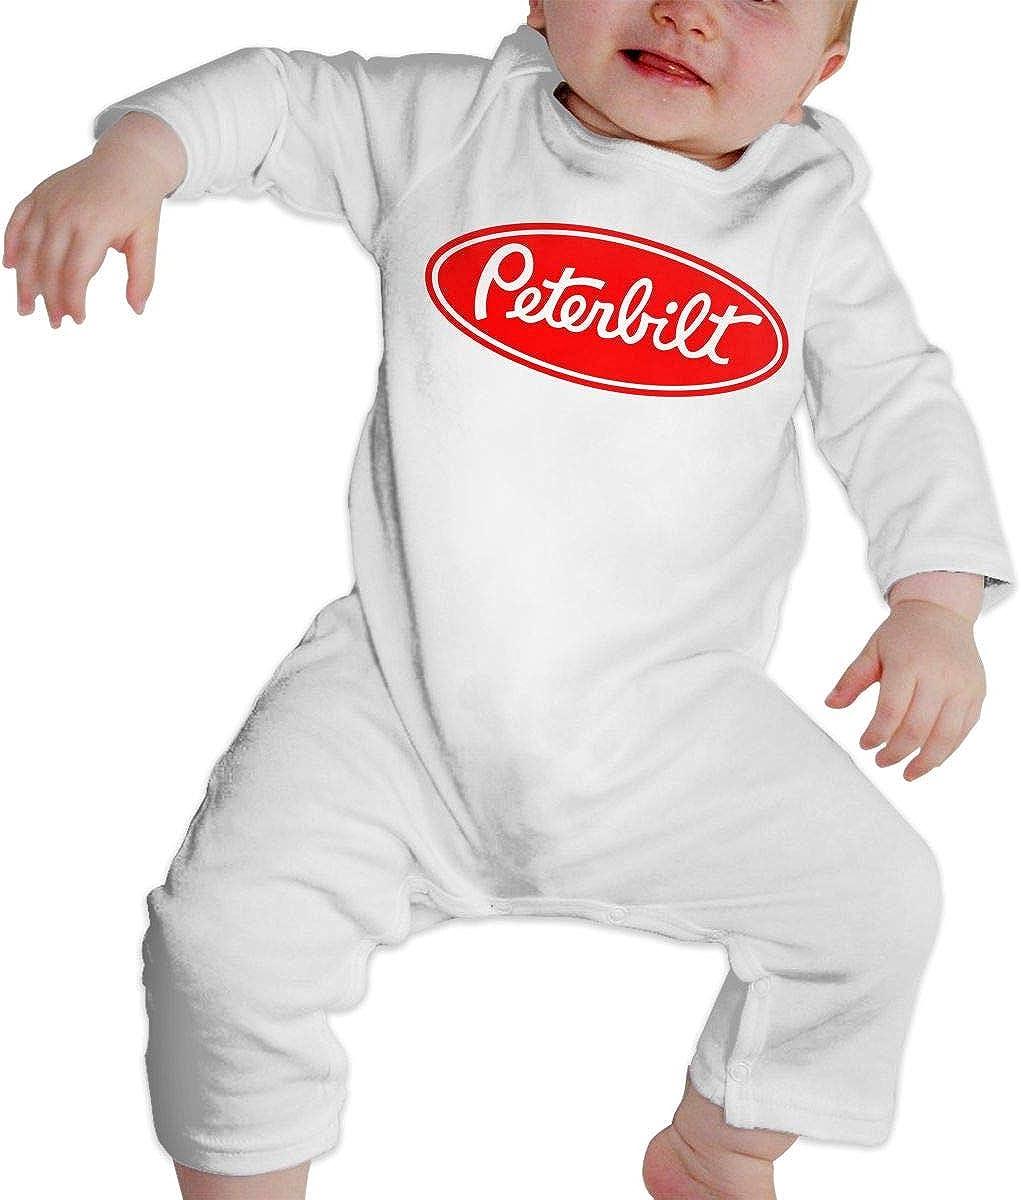 Peterbilt CustomART Baby Jumpsuit Baby Romper Long Sleeve Bodysuit